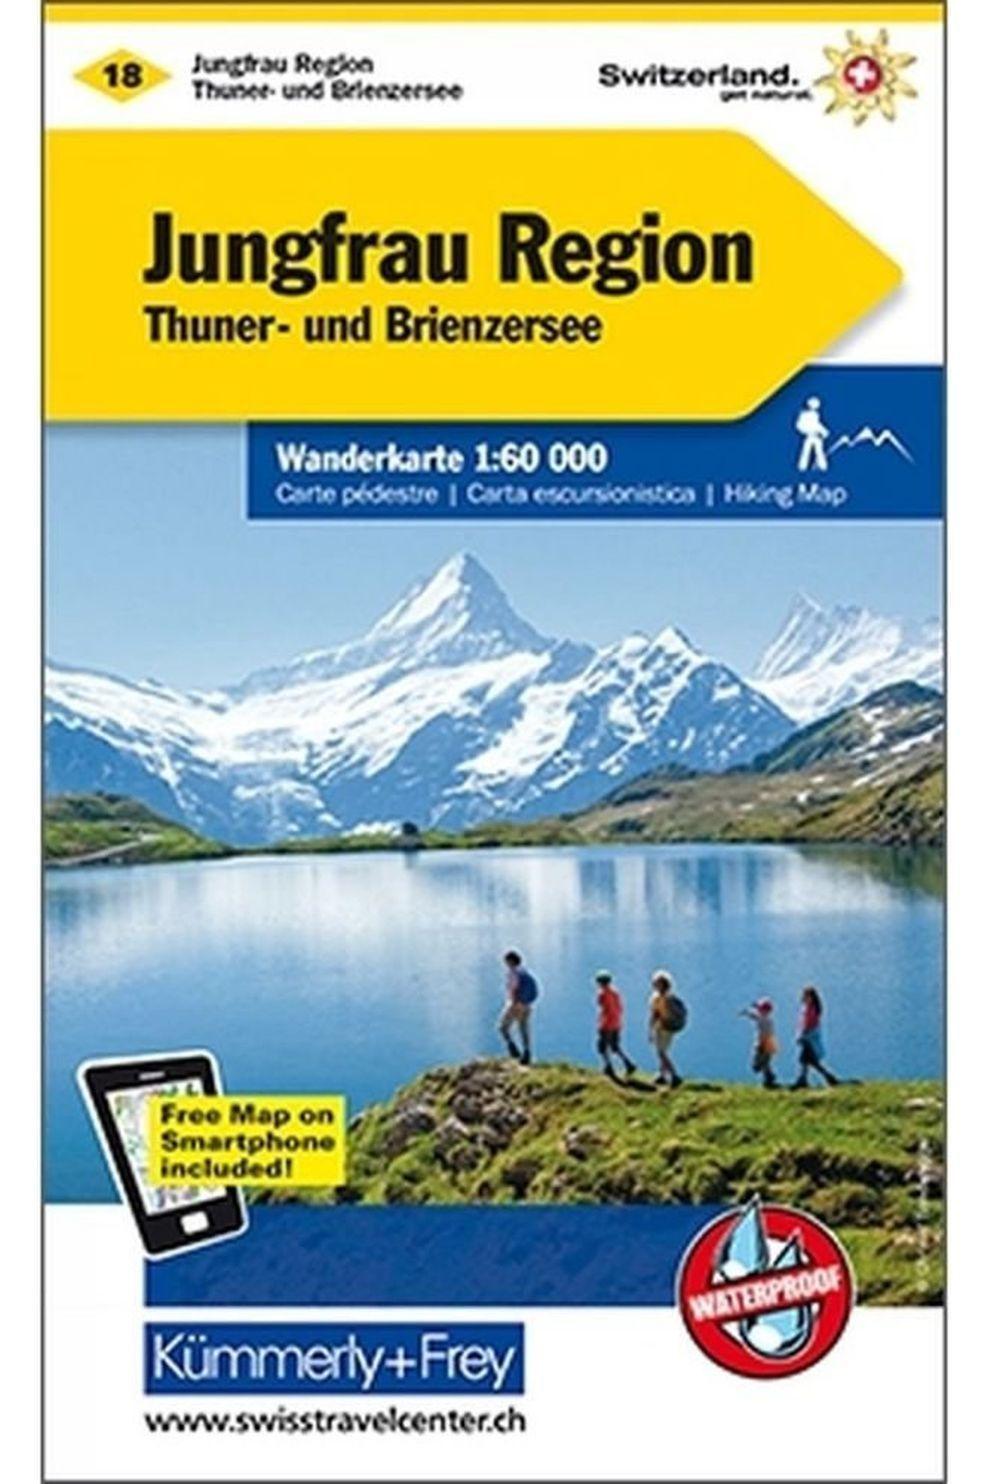 K&F Jungfrau & Omg.18 K&F R/V (R) Wp Gps - 9024